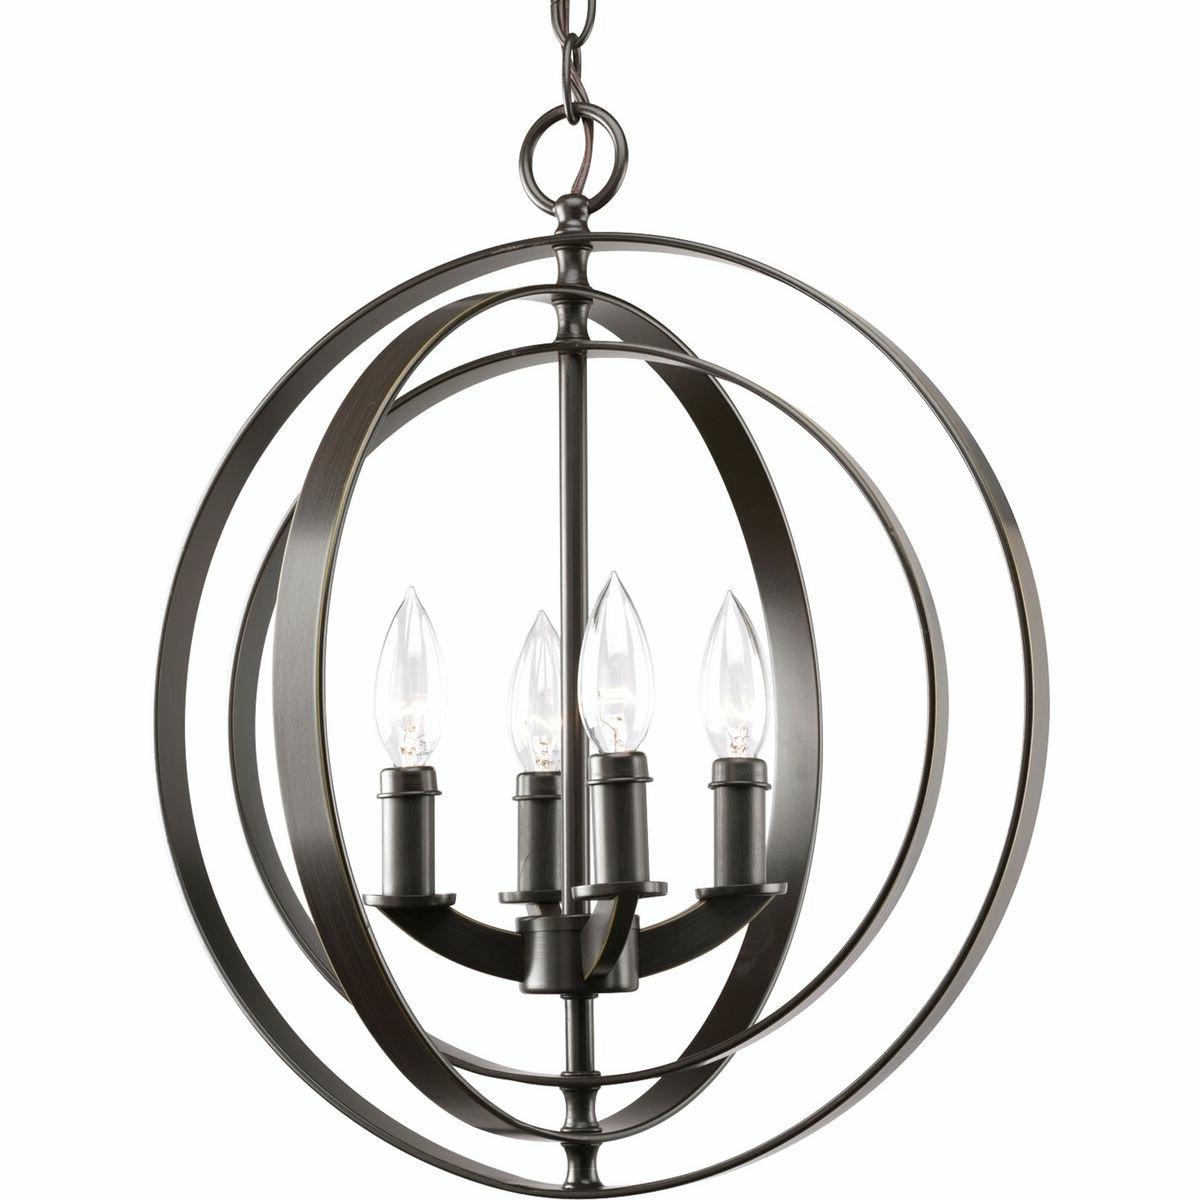 Morganti Foyer 4 Light Globe Chandelier Throughout Current Morganti 4 Light Chandeliers (View 4 of 20)